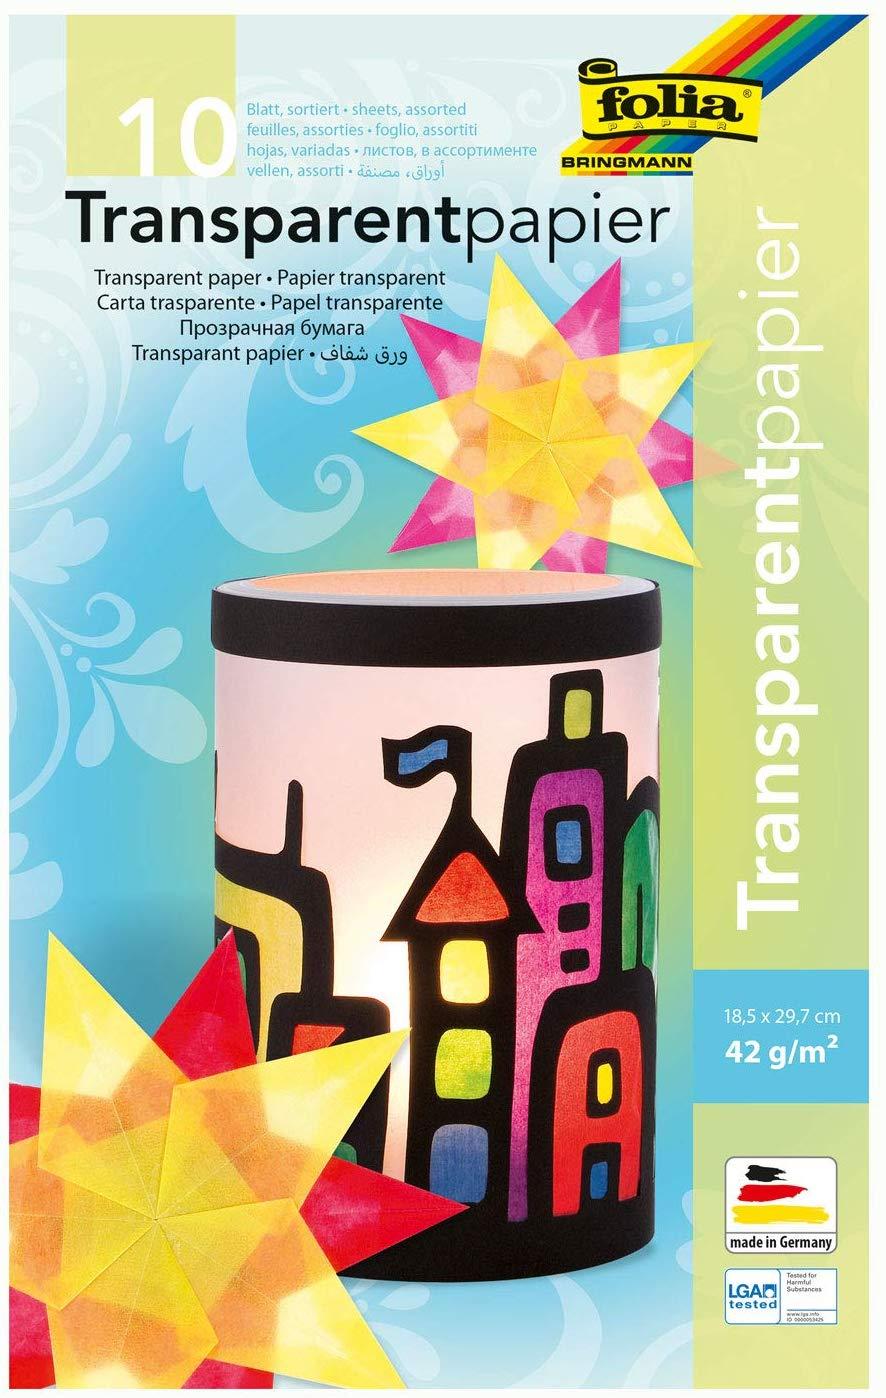 folia 810 - Mappe mit Transparentpapier, 10 farbig sortiert, 10 Blatt, 42 g/qm, ca. 18,5 x 29,7 cm,